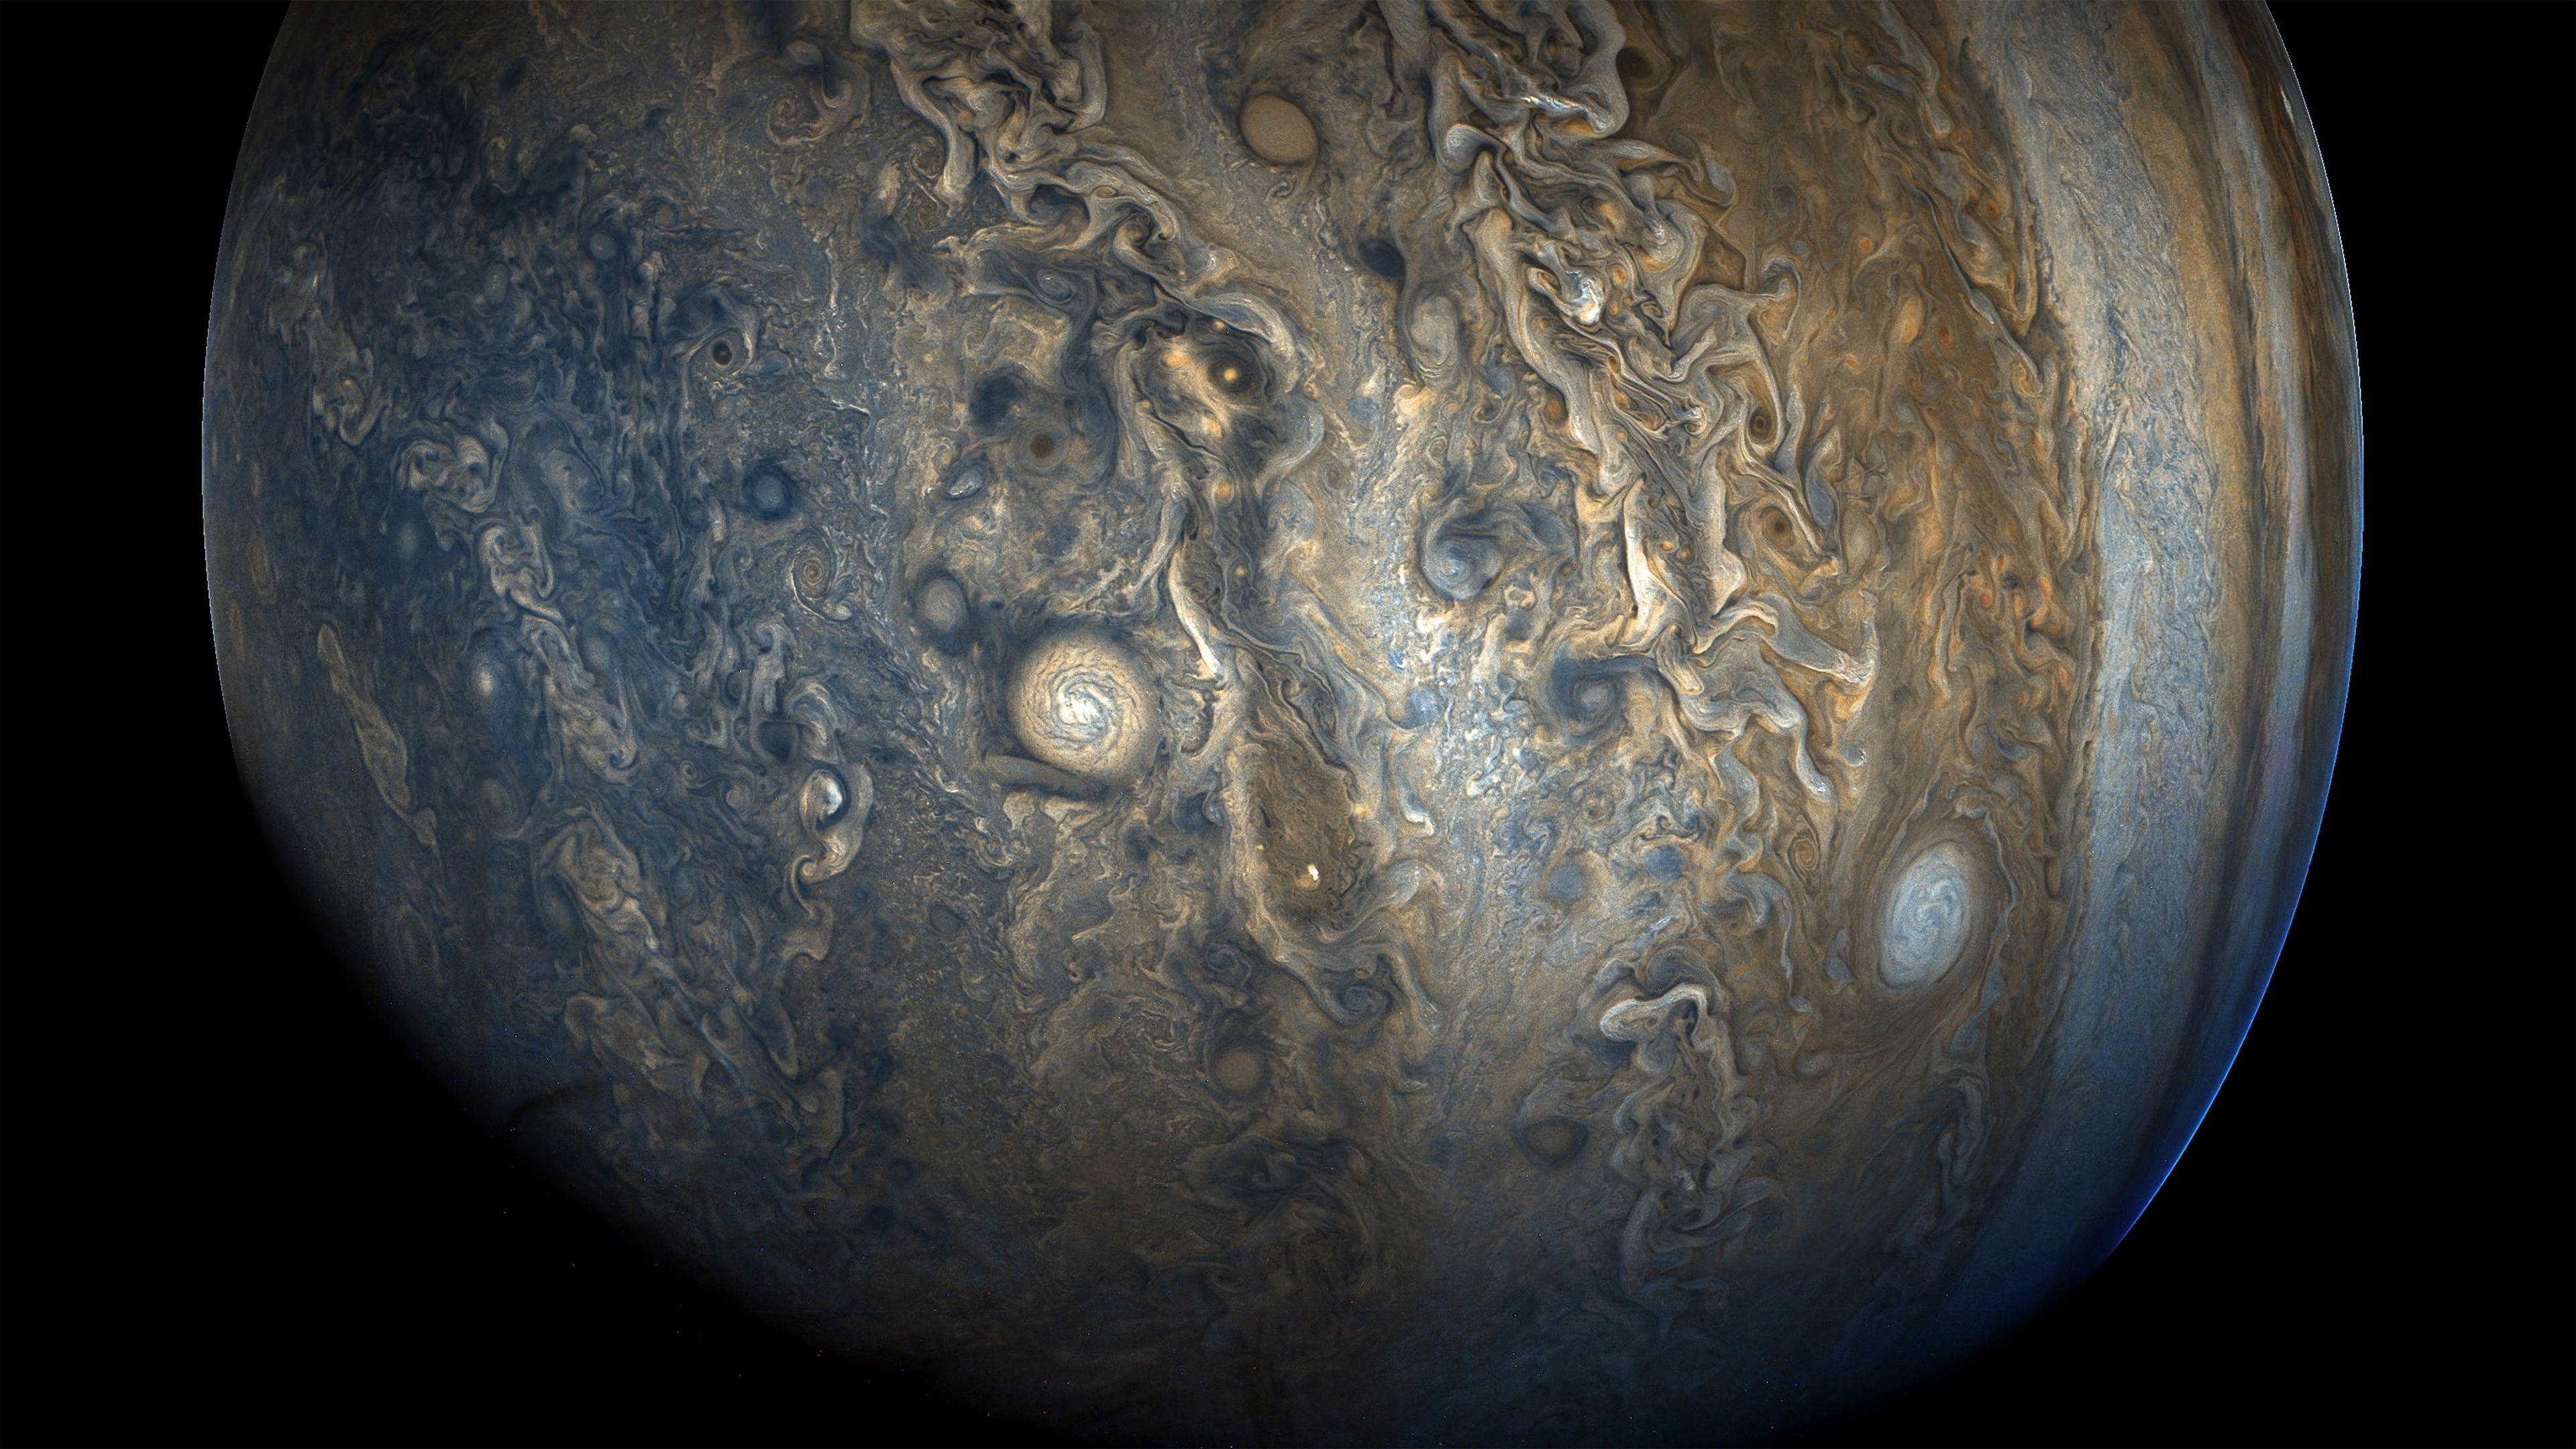 Southern Hemisphere 4k Juno Spacecraft Jupiter Nasa 4k Wallpaper Hdwallpaper Desktop Juno Spacecraft Nasa Juno Spacecraft